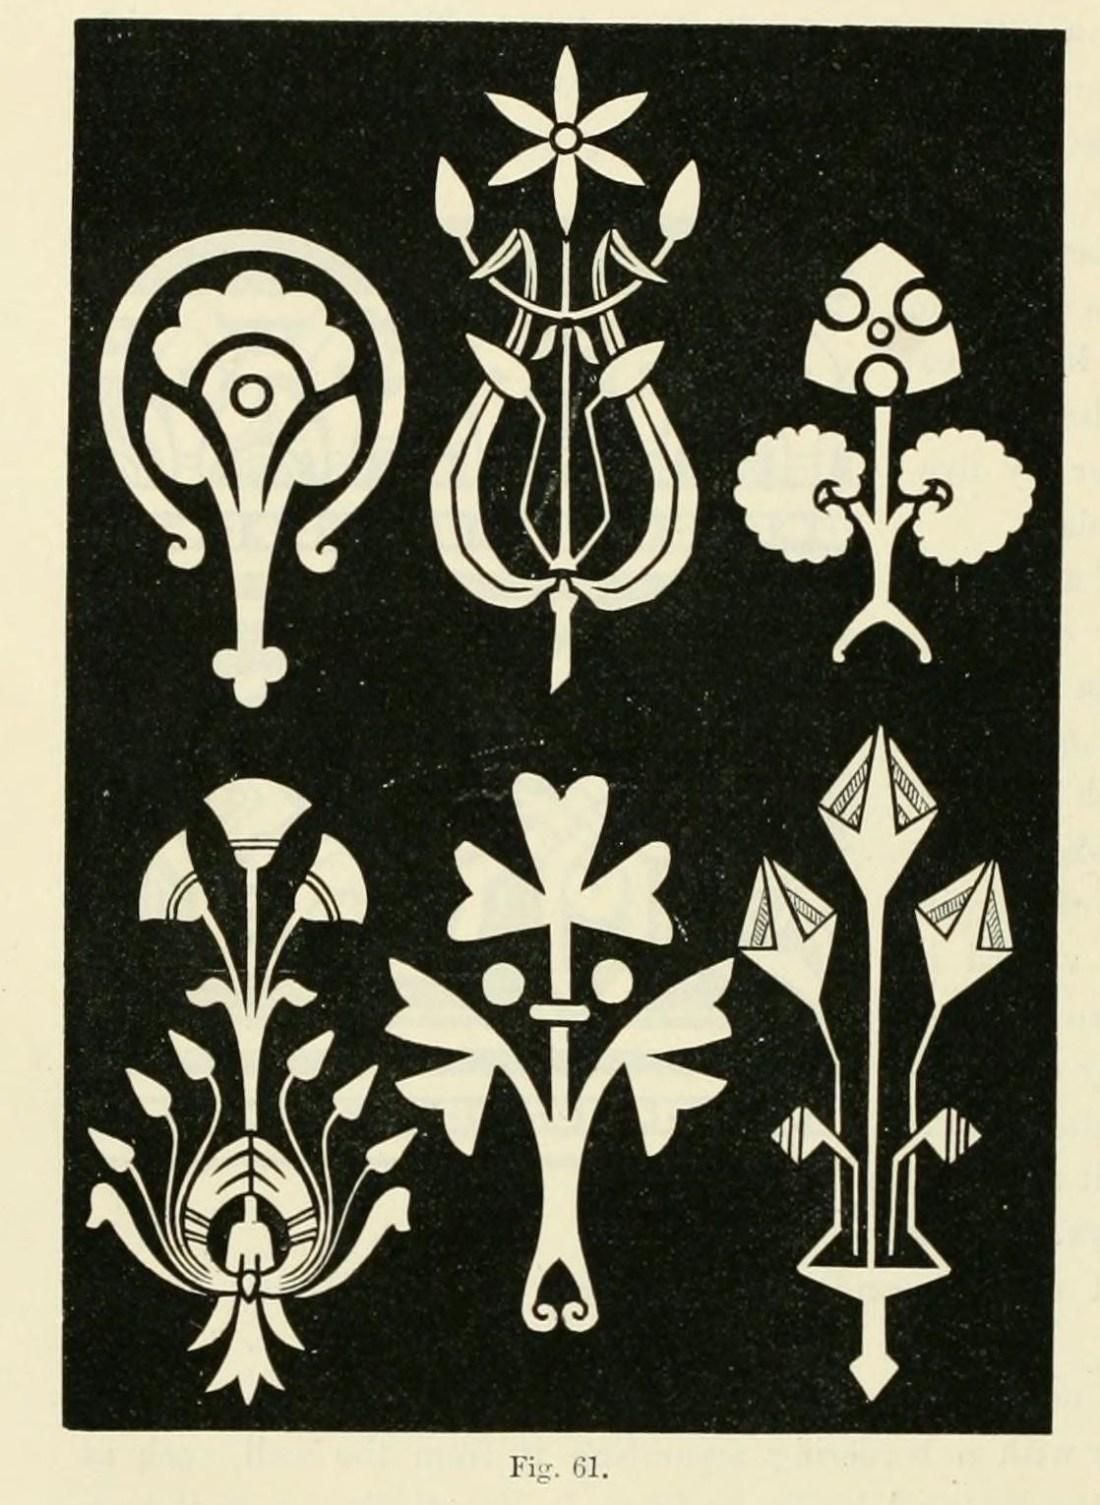 Figure 61, page 86.